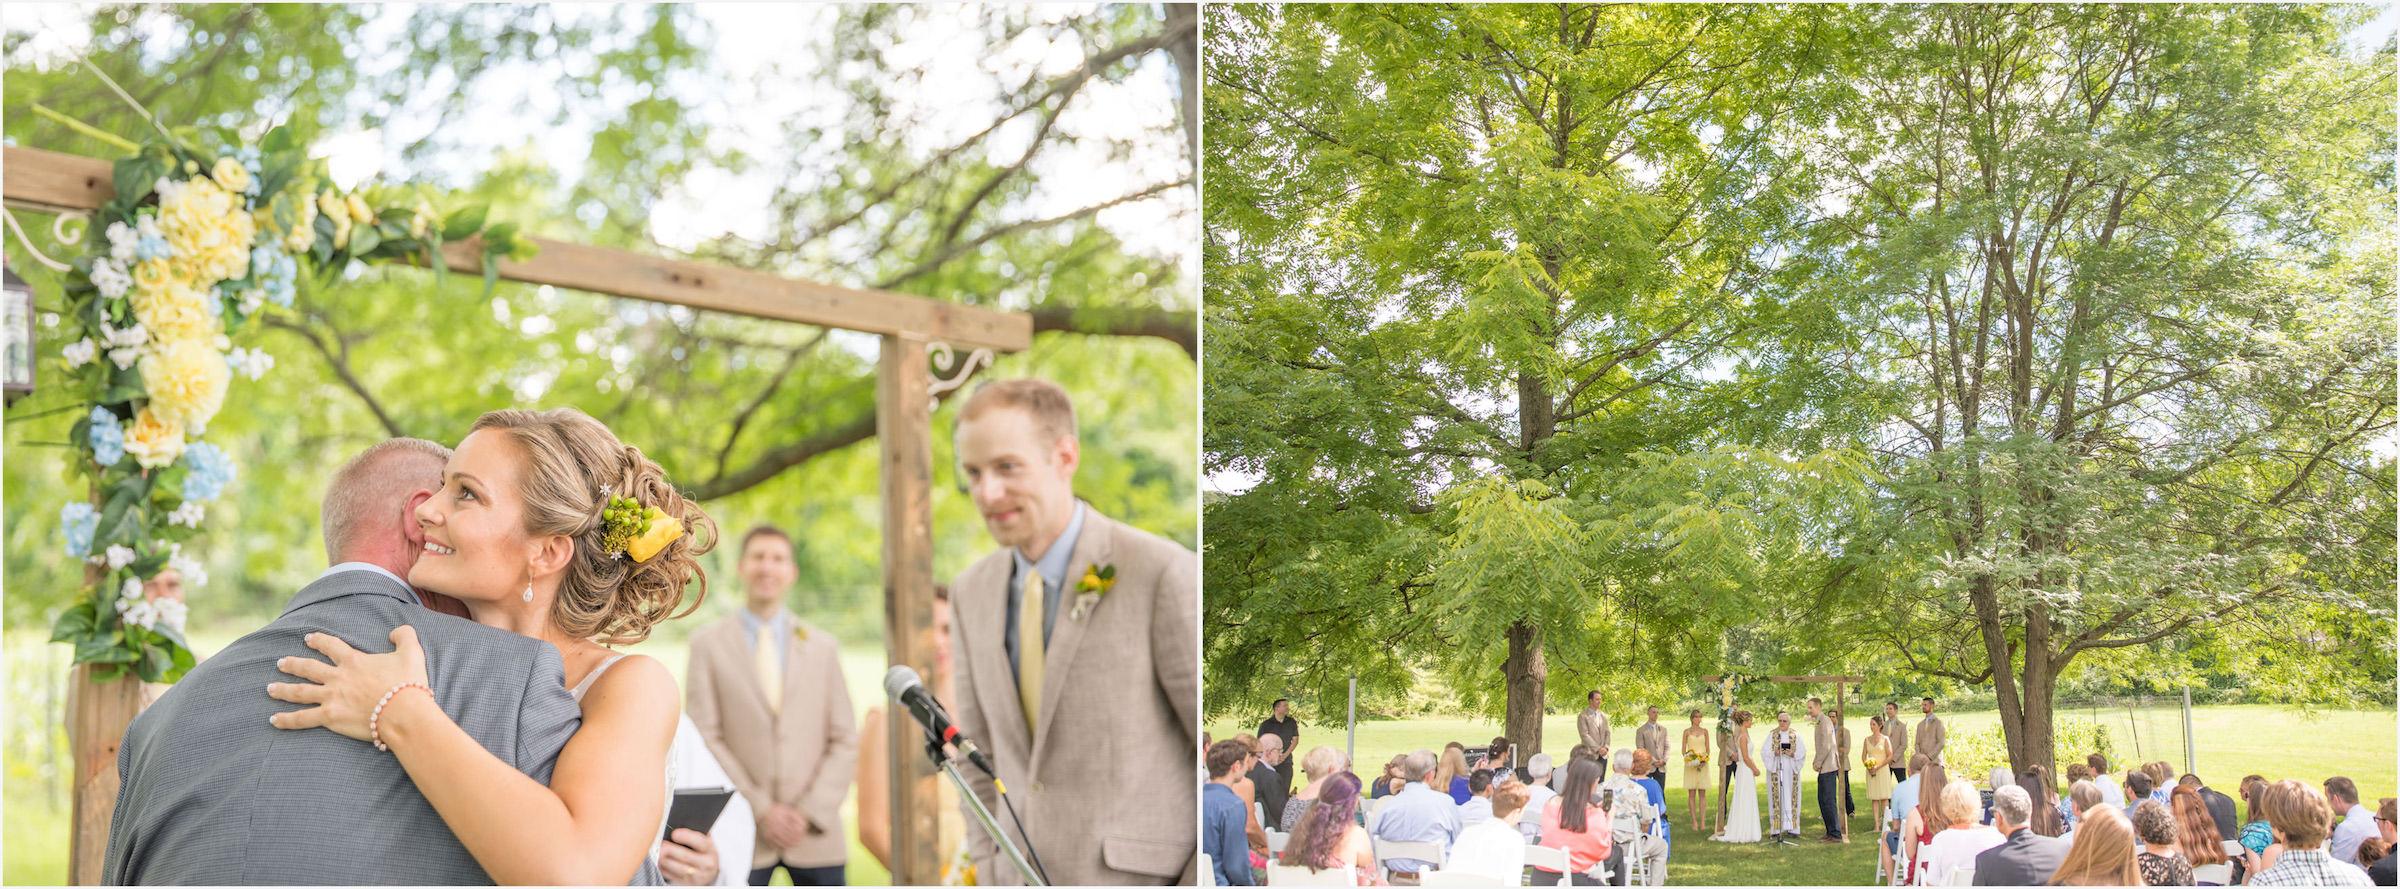 Cassondre Mae Photography Warwick NY Wedding Photographer -8.jpg